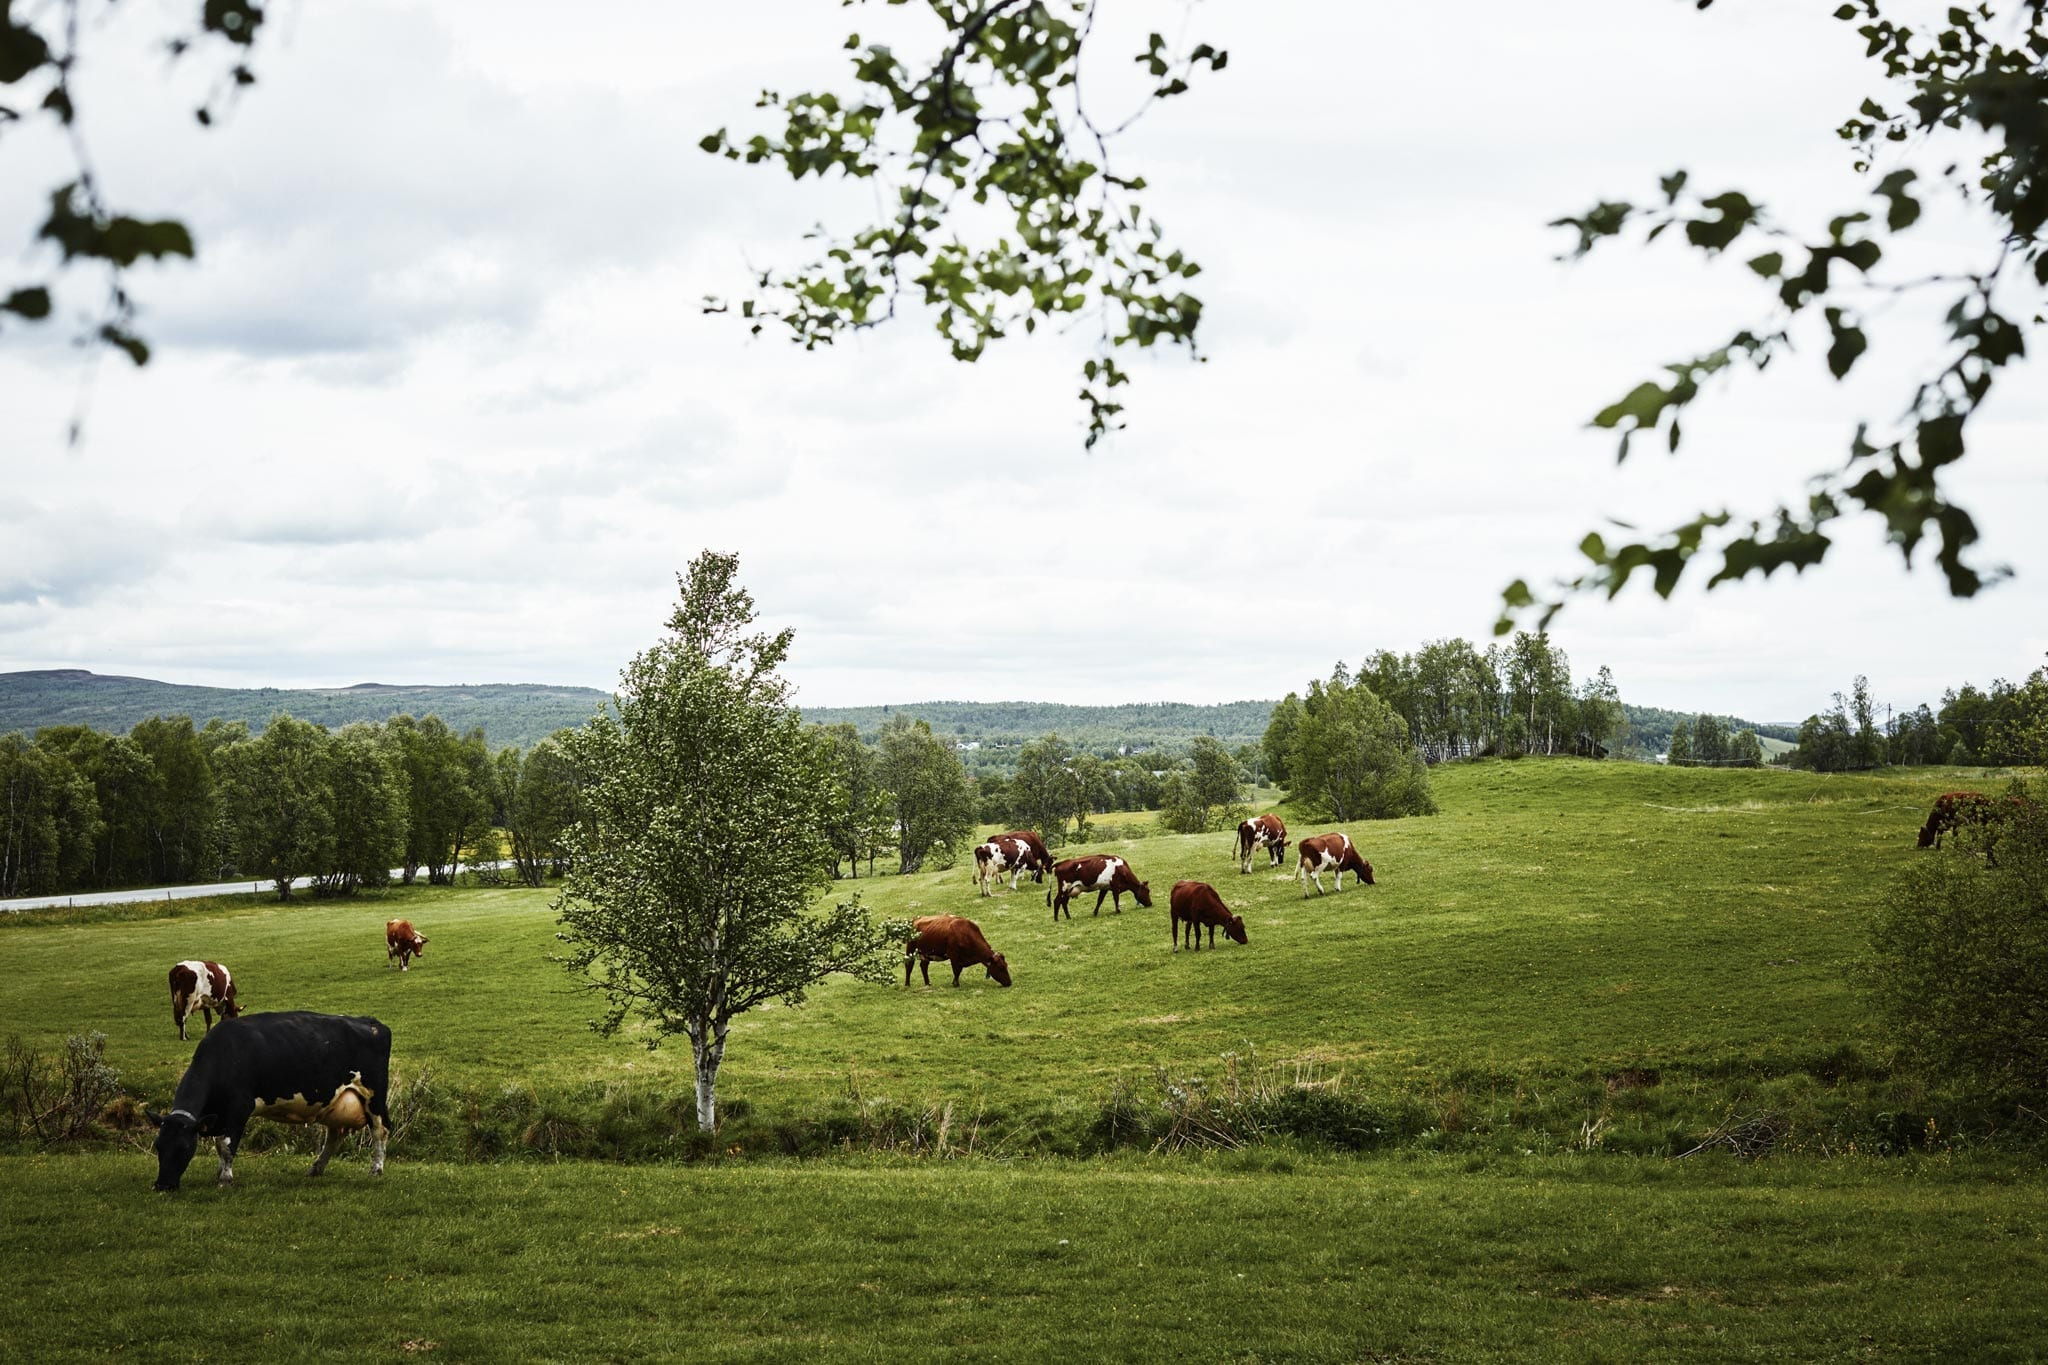 Foto: Øivind Haug